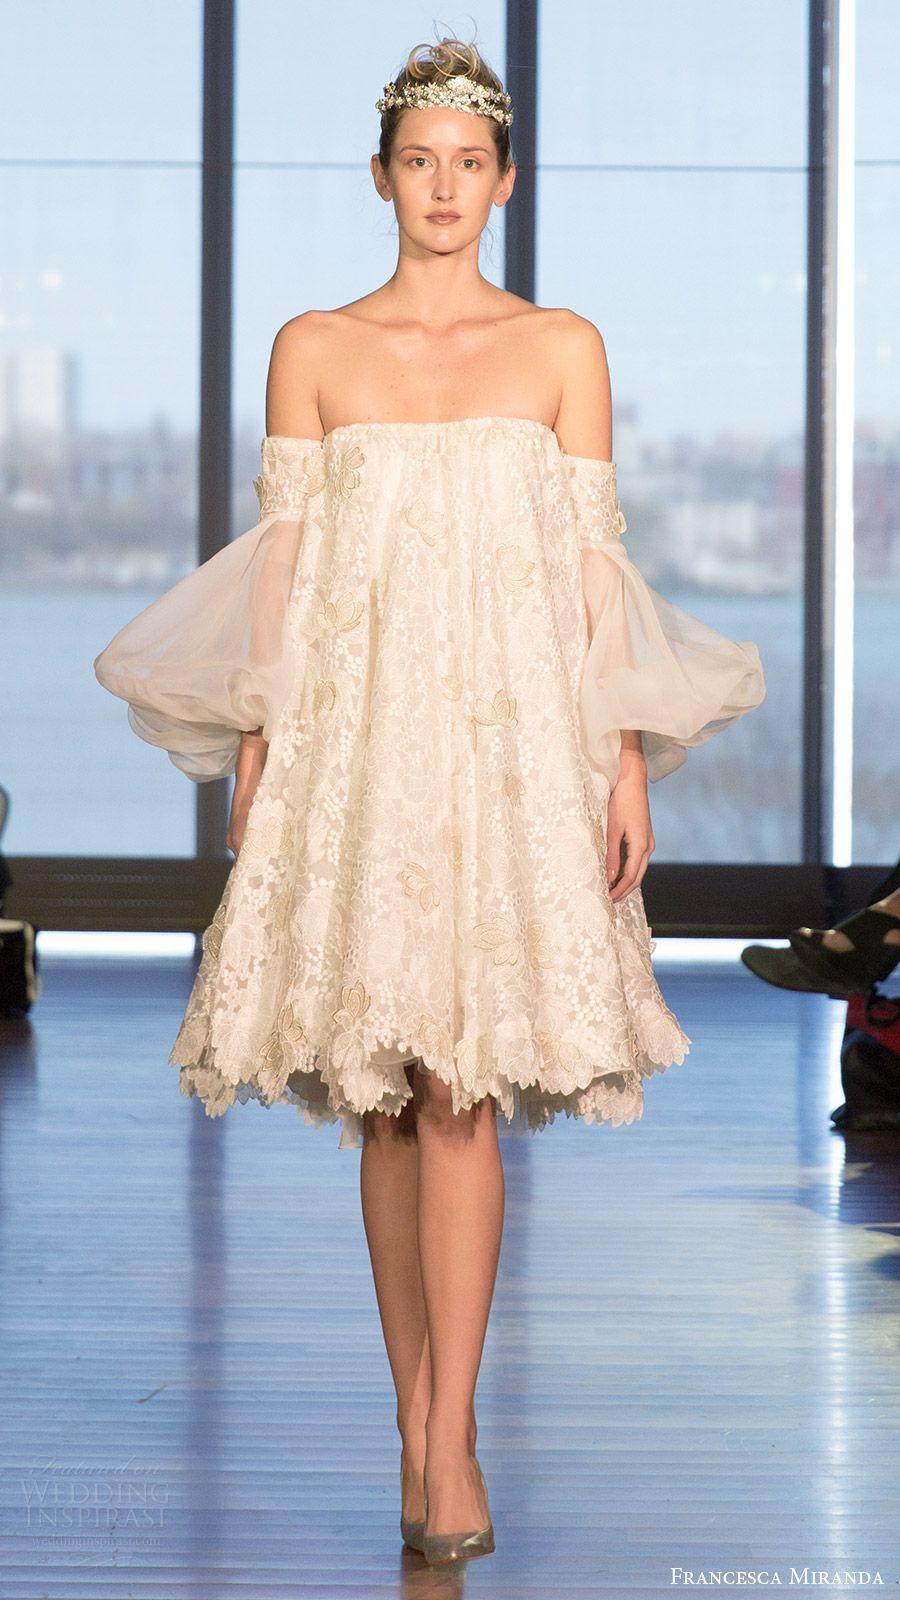 Francesca miranda spring 2017 wedding dresses lace for Short spring wedding dresses